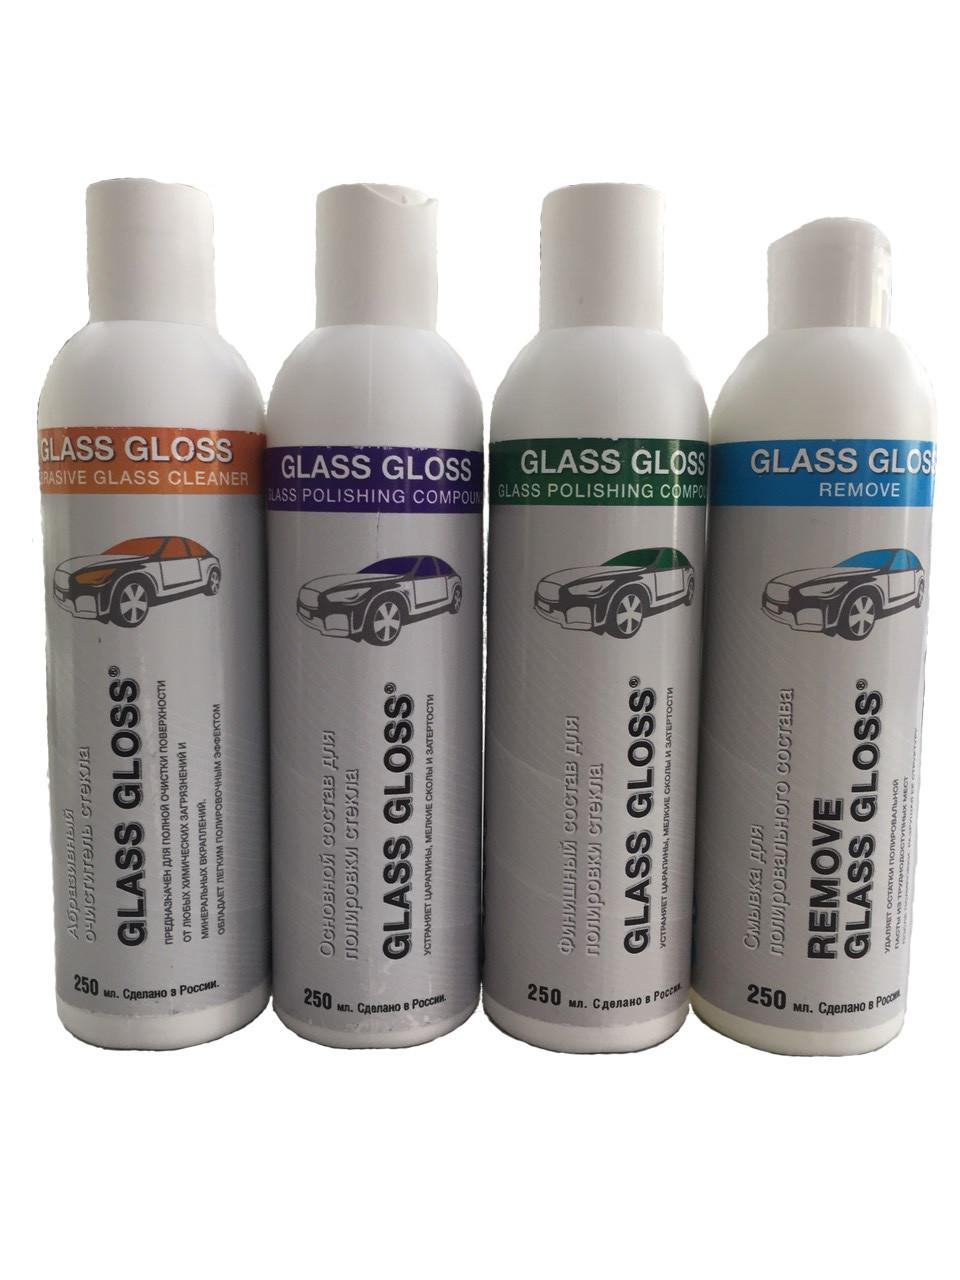 Набор для полировки стекла - Glass Gloss 250 мл./4 шт.